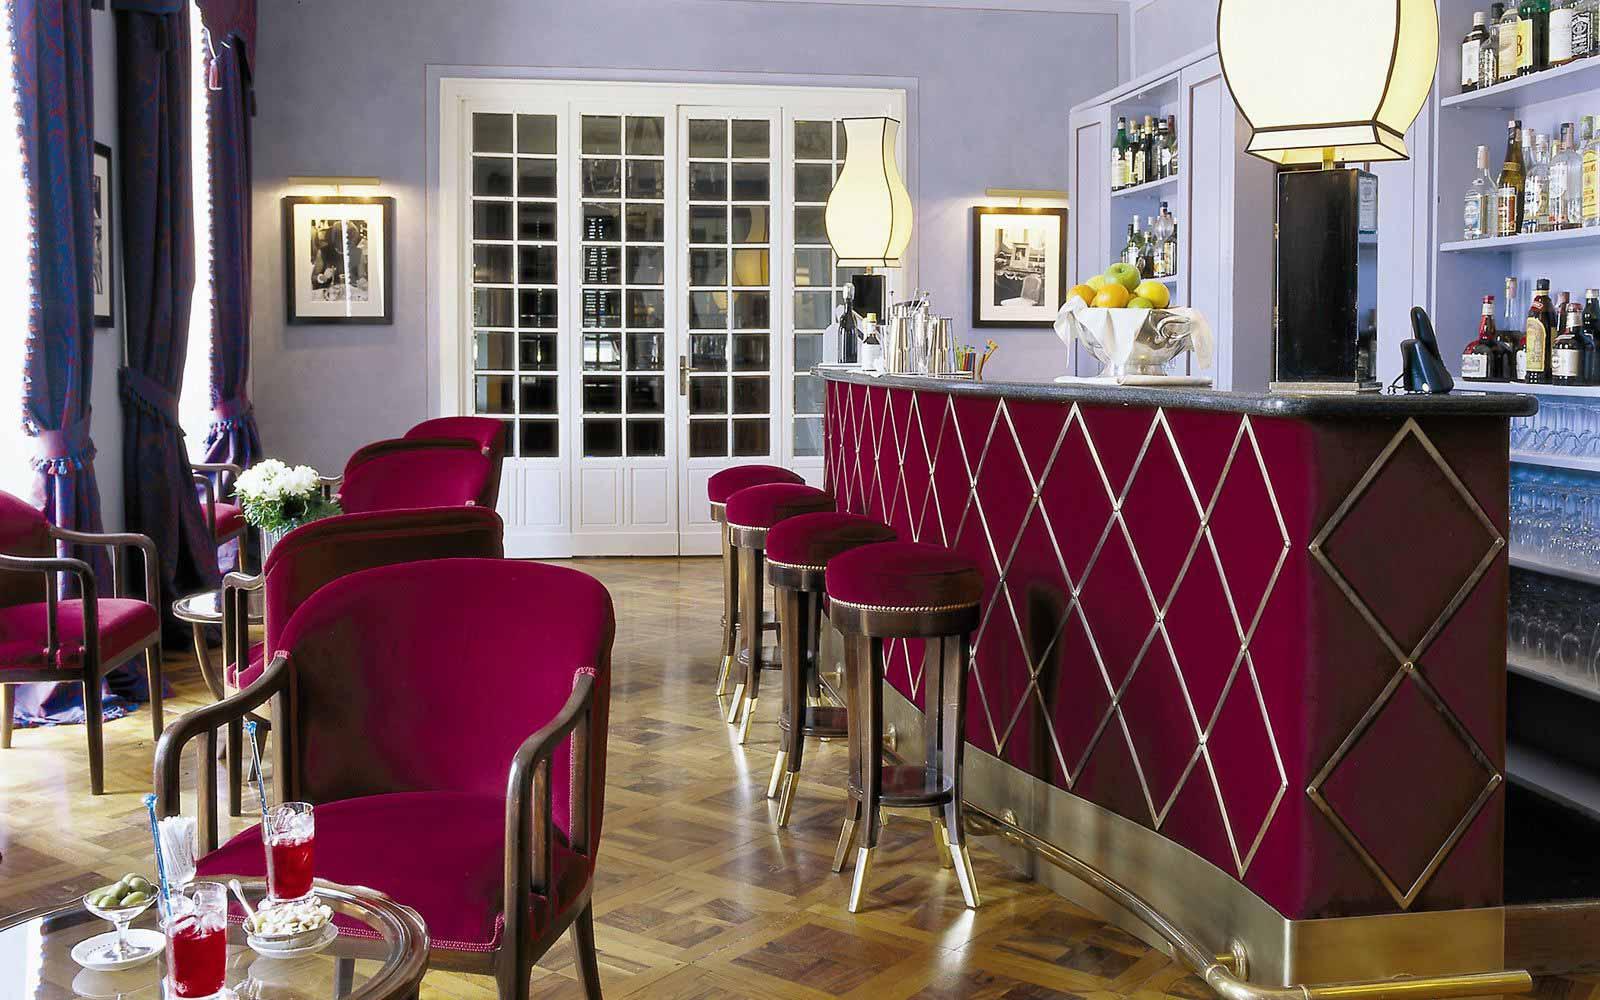 Bar at Grand Hotel Majestic